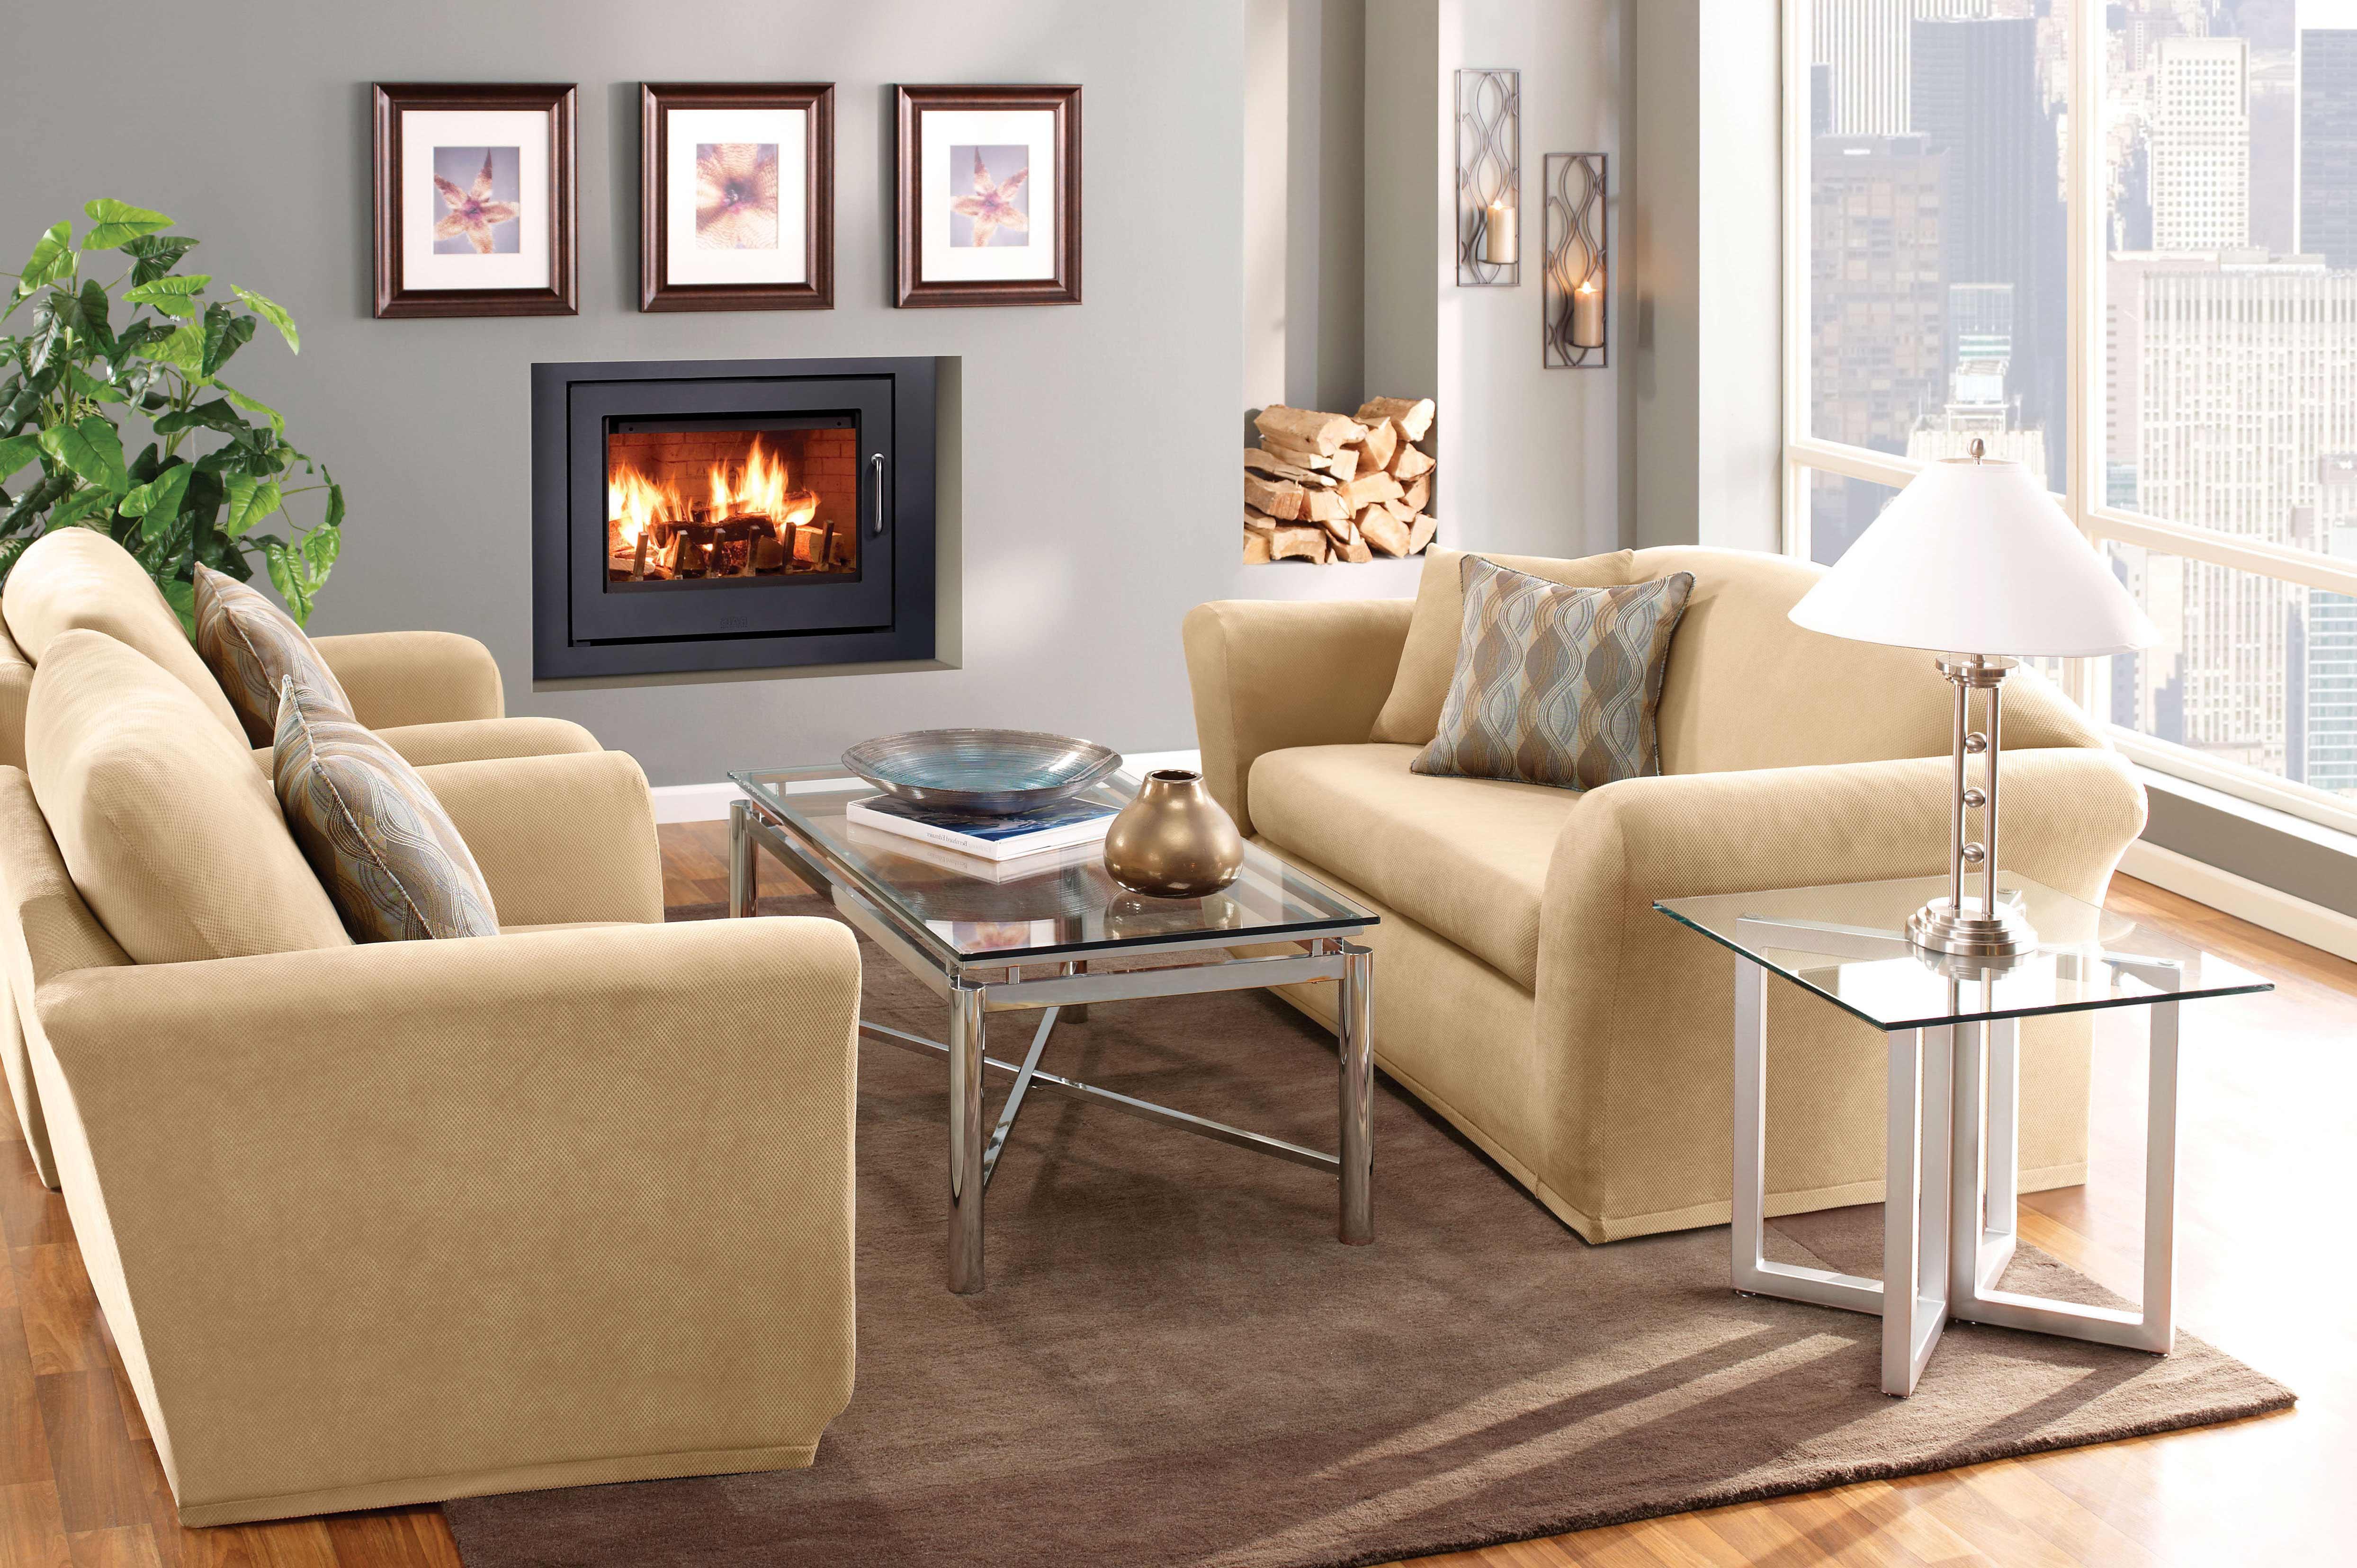 Affordable Modern Italian Living Room Furniture